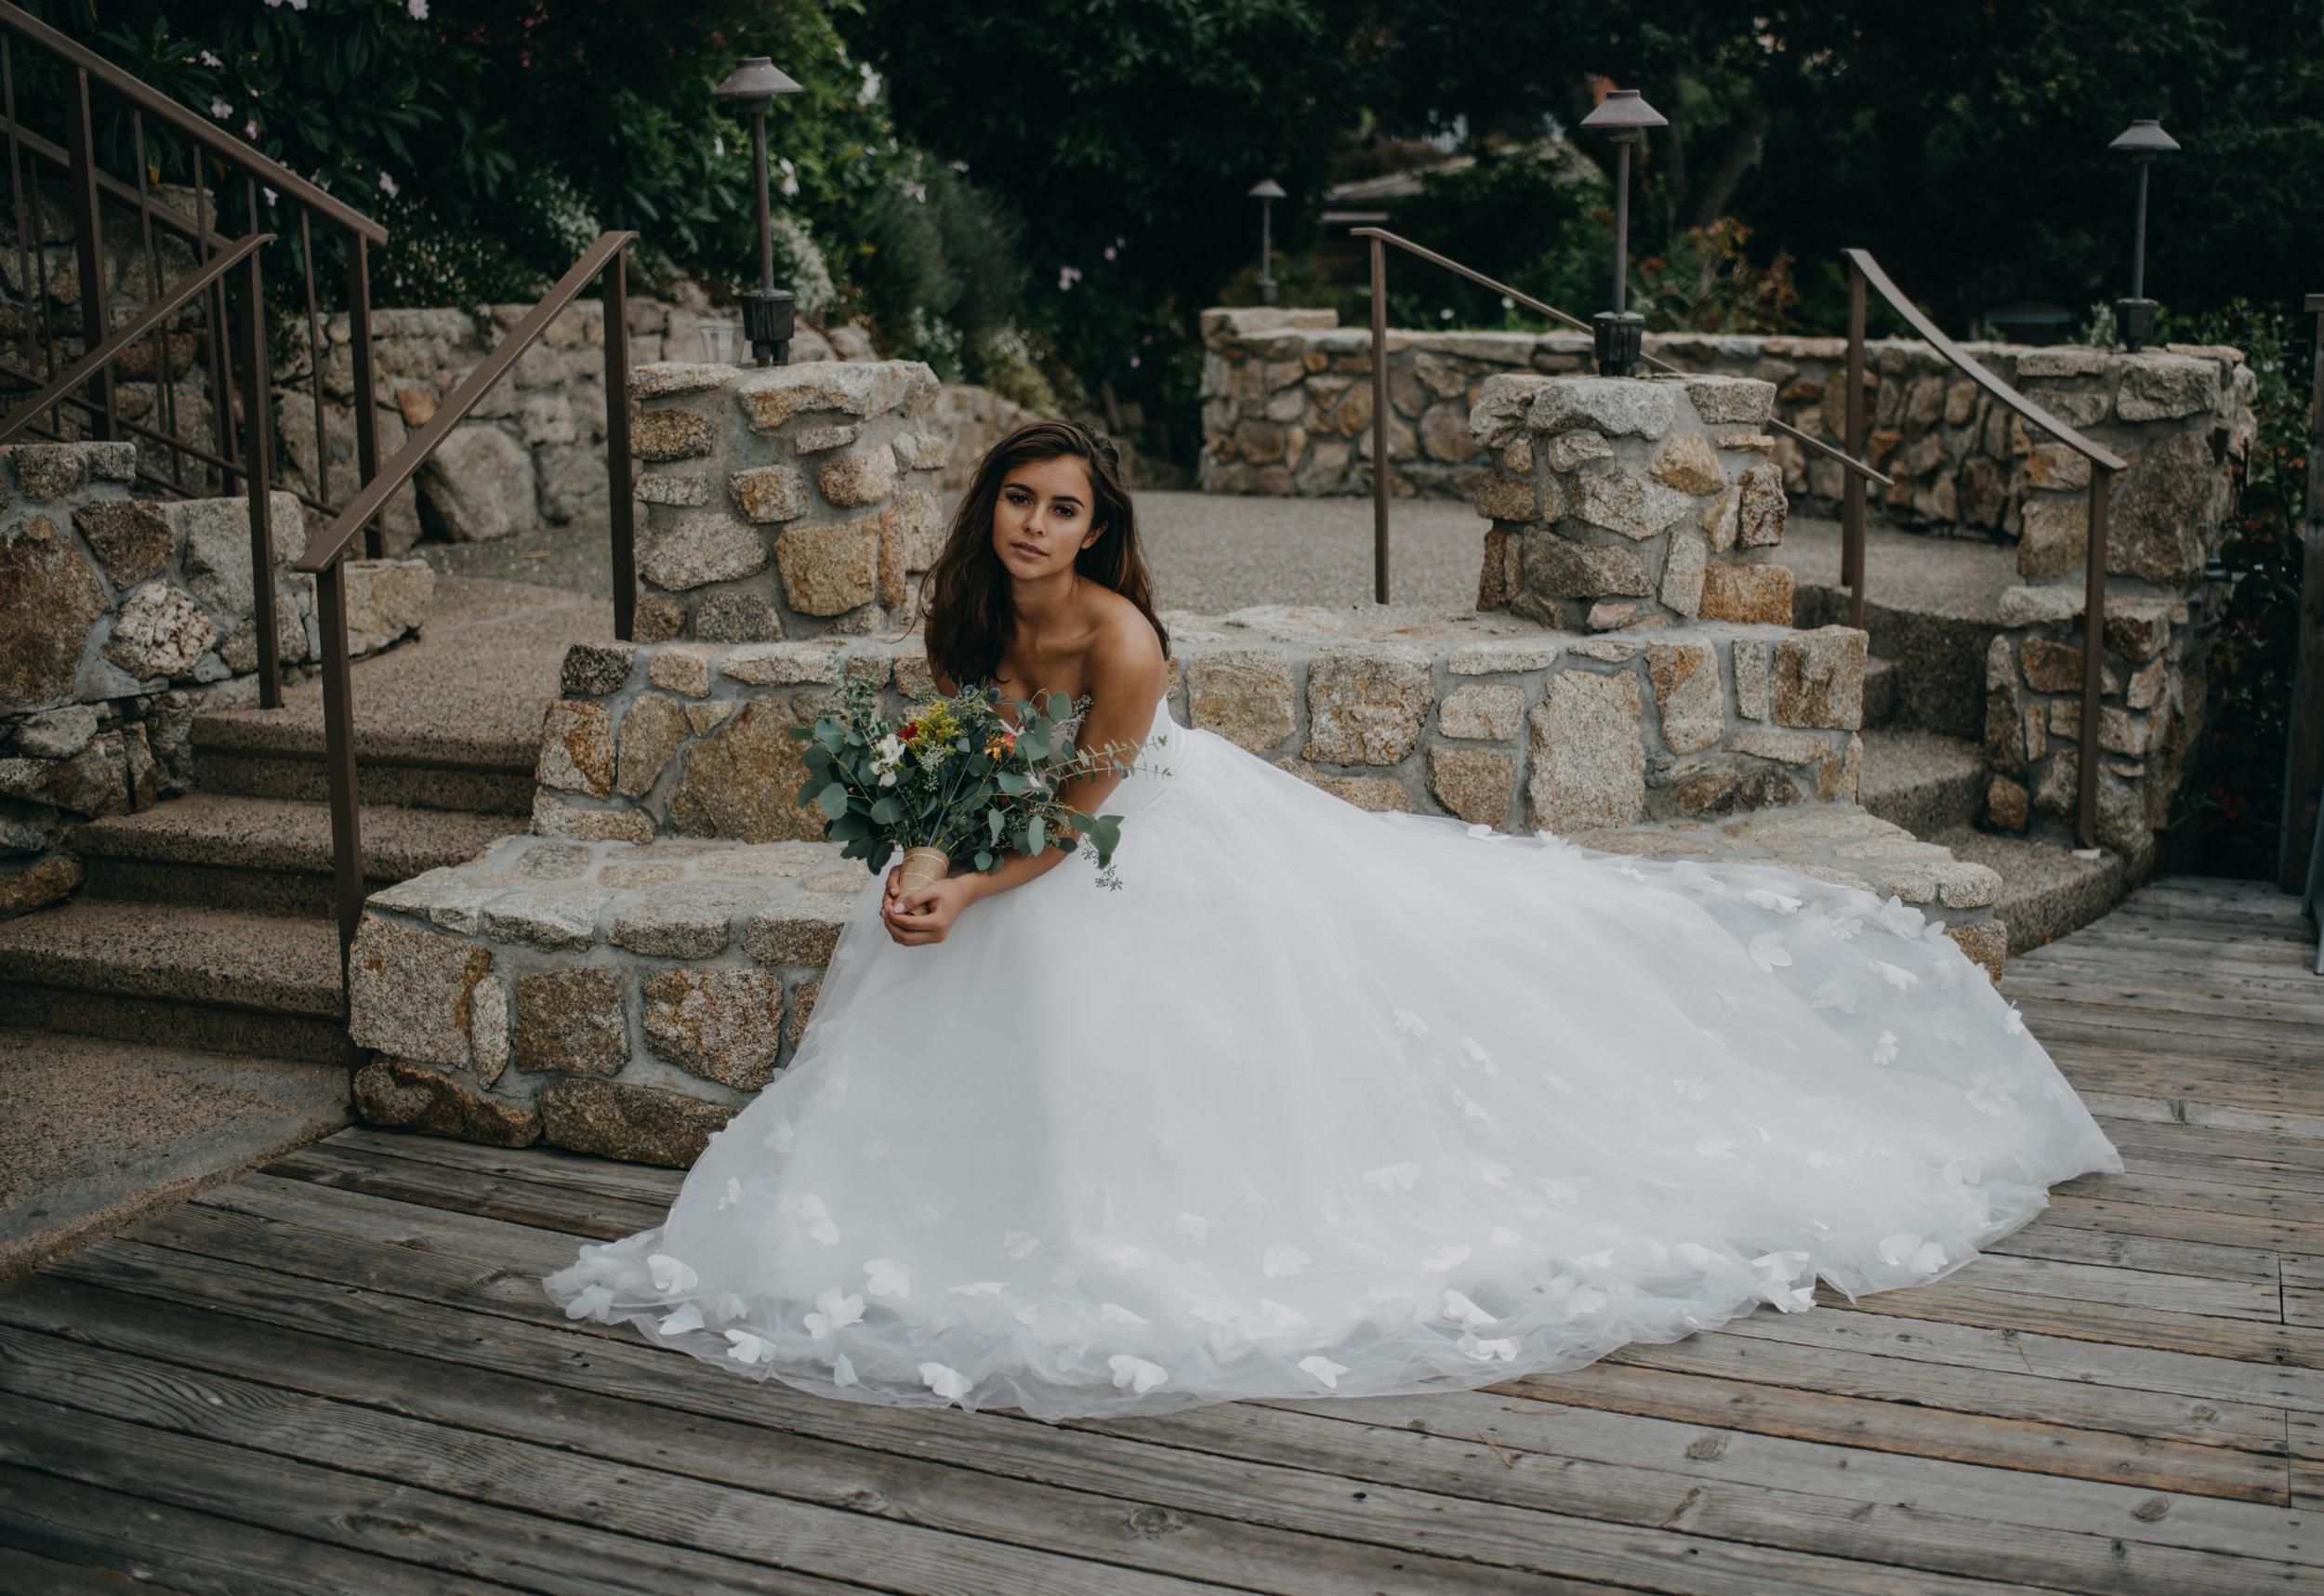 luxury resorts wedding summer wedding custom made affordable wedding dress